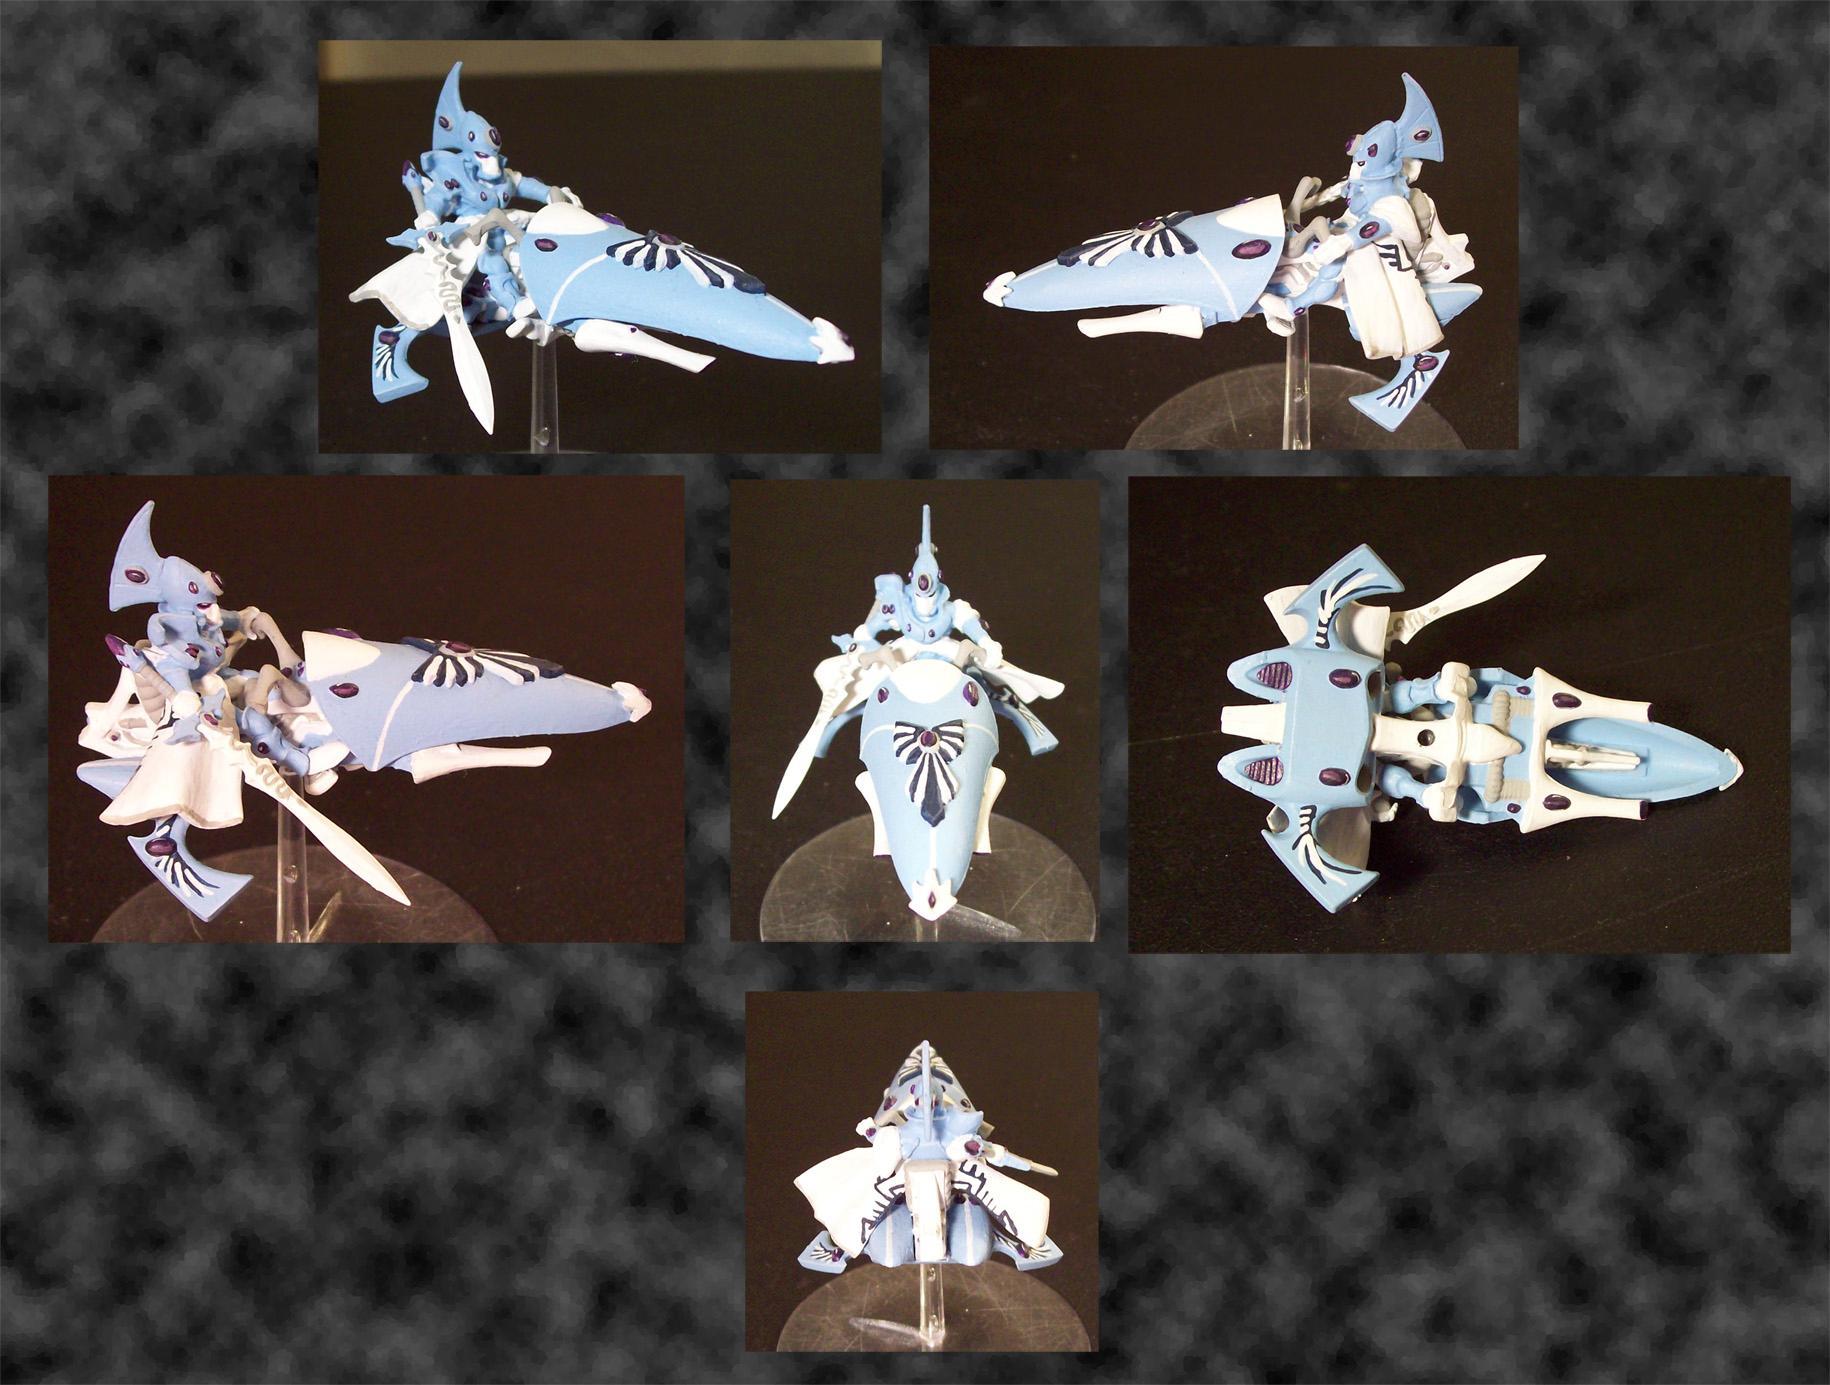 Blue, Bringer, Eldar, Farseer, Headquarters, Storm, Stormbringer, Warhammer Fantasy